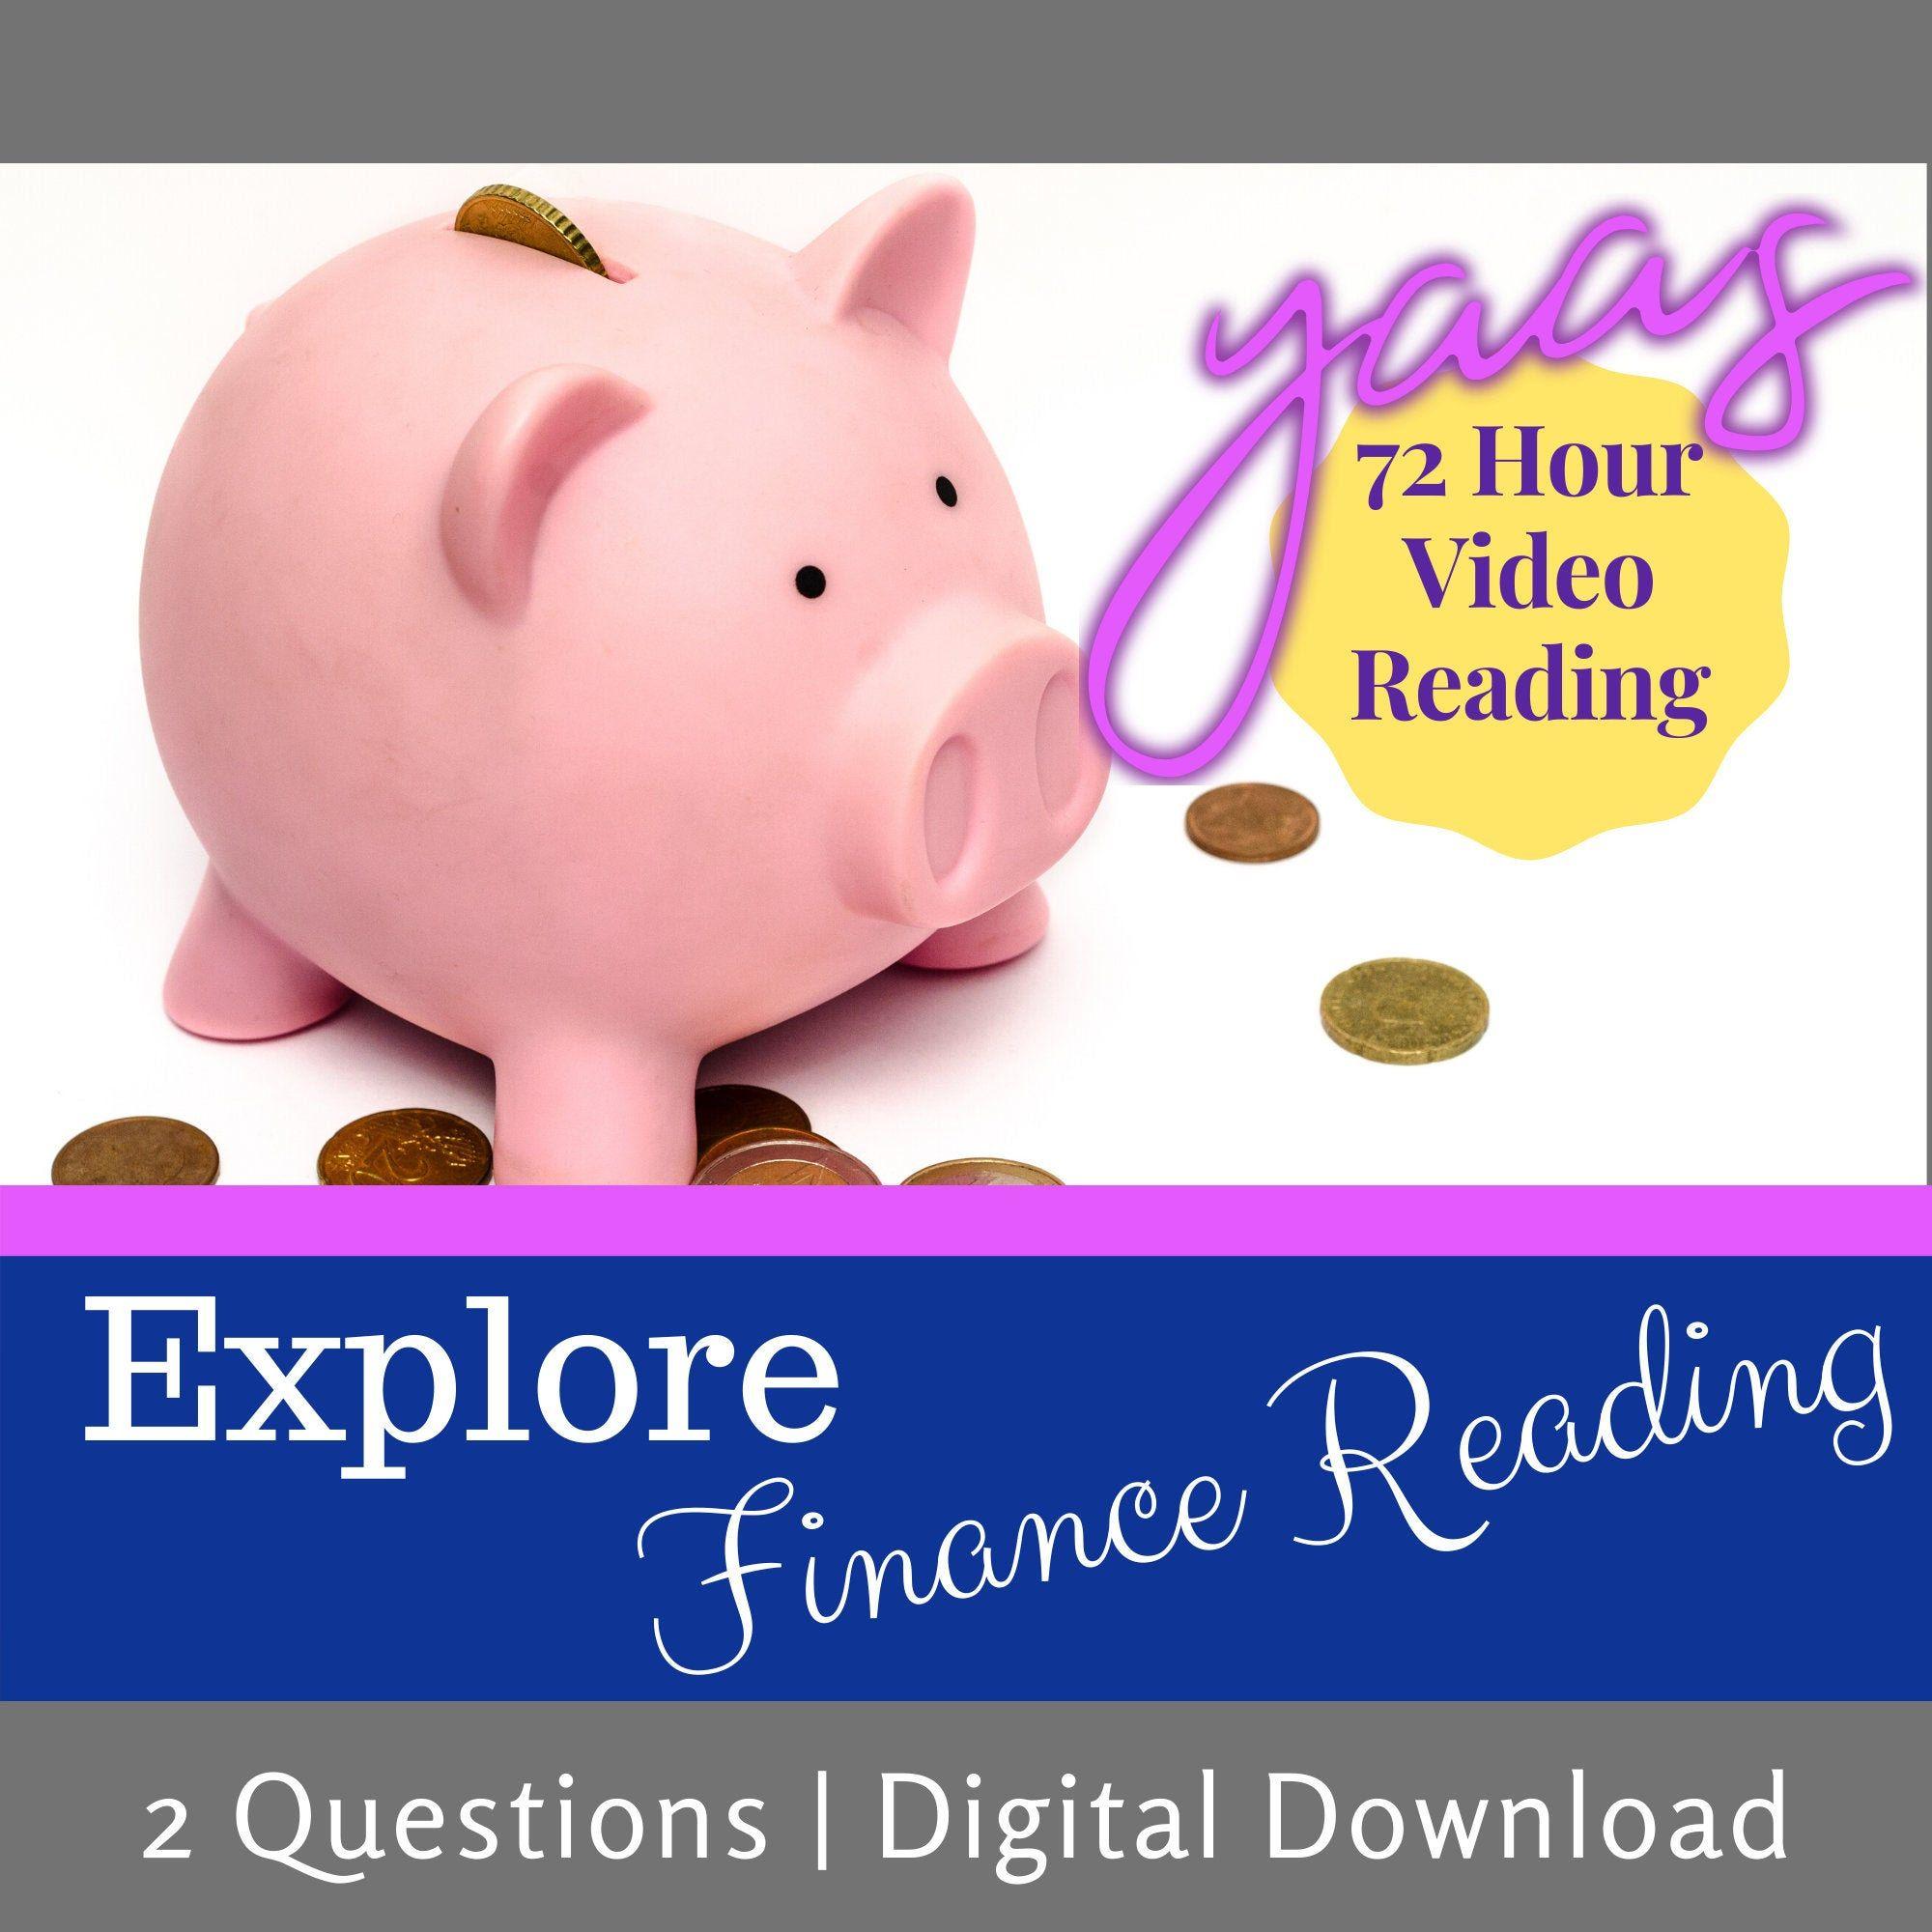 Finance video tarot reading 72 hour tarot reading